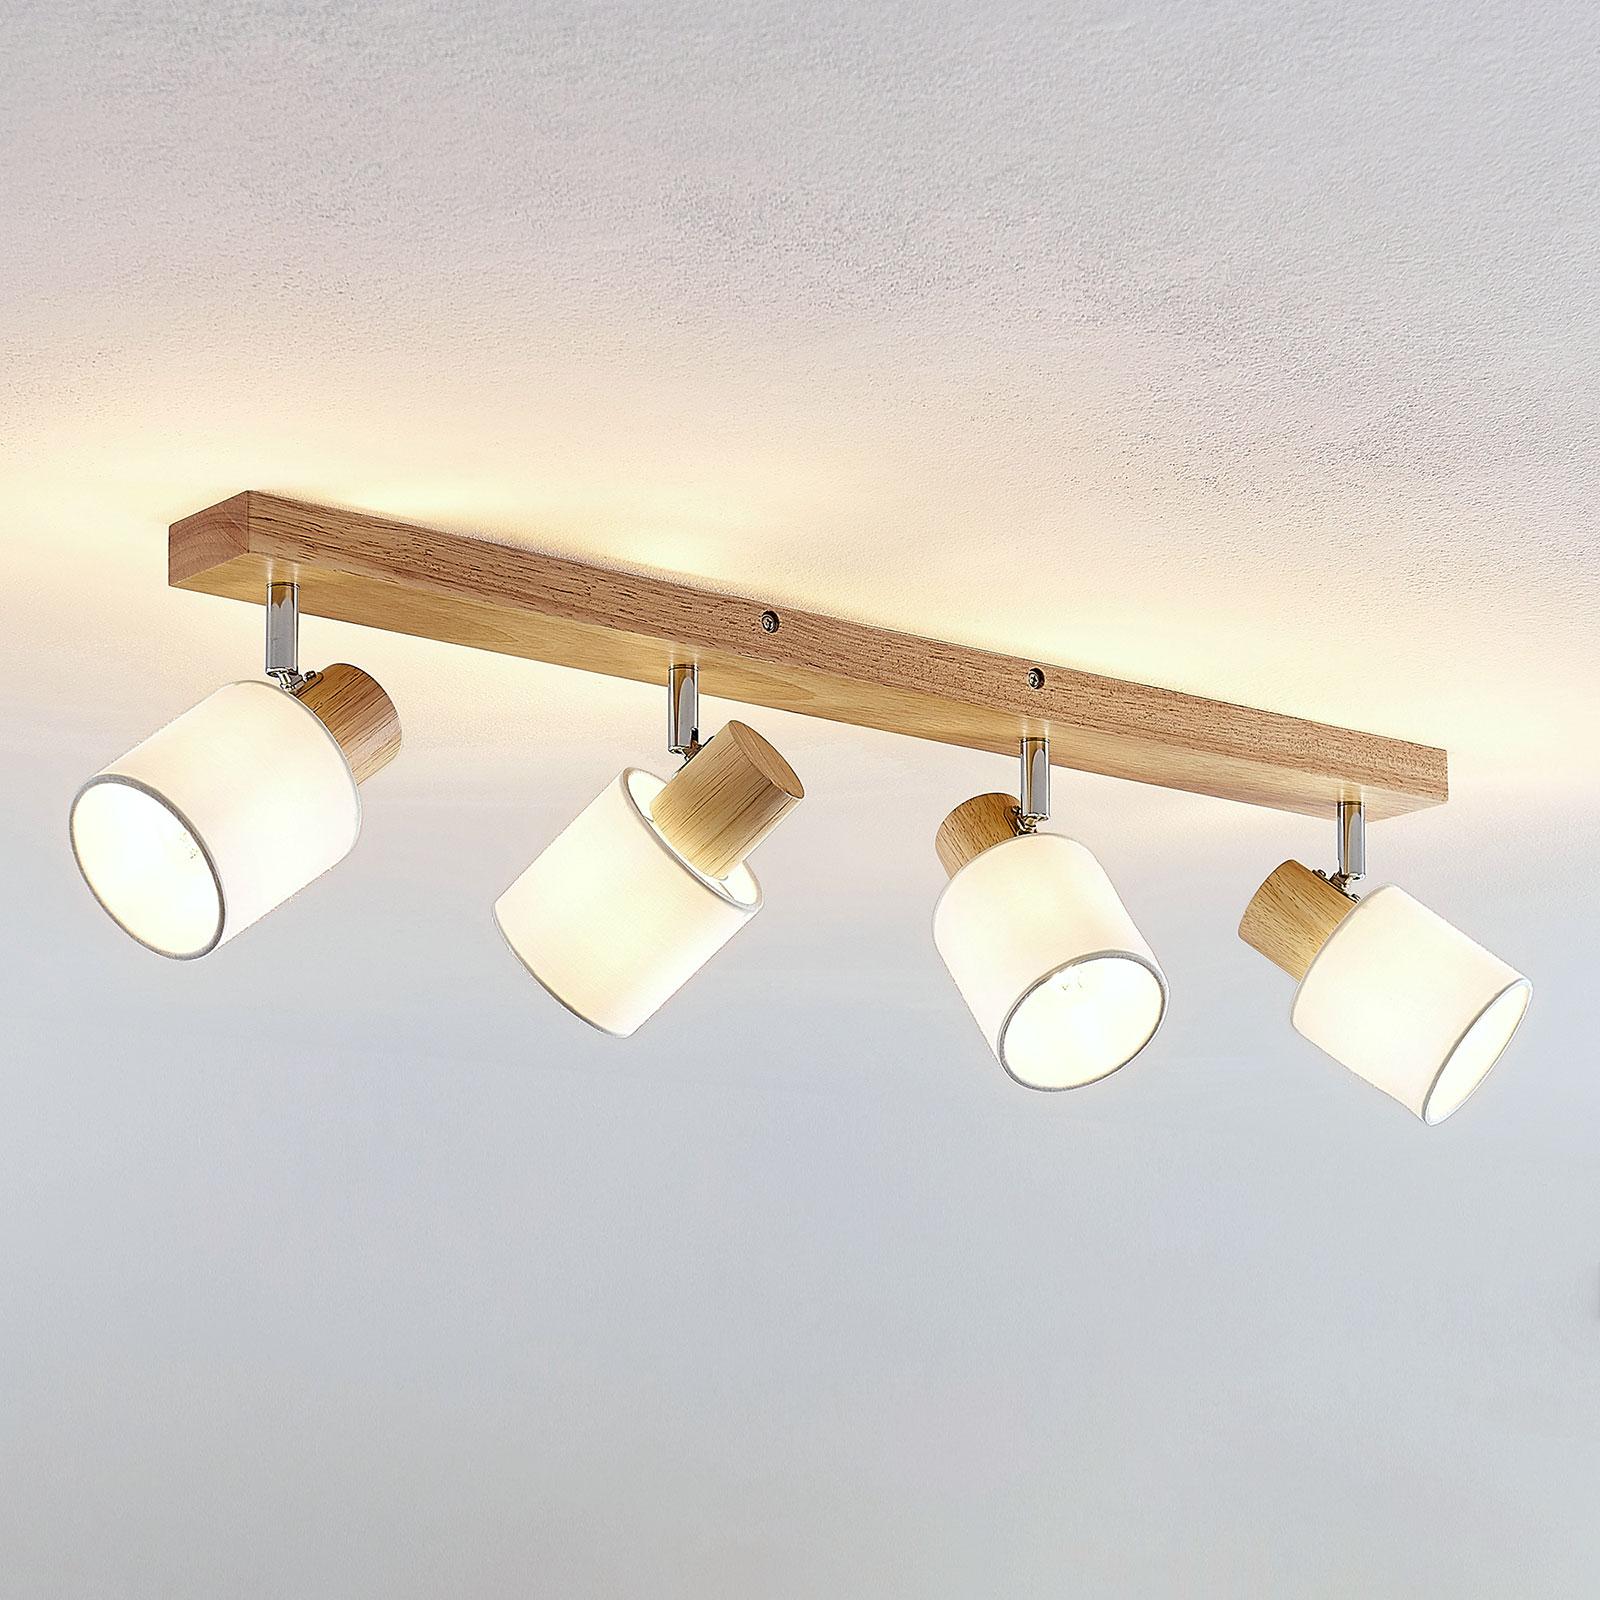 Lindby Wanessa spot da soffitto a 4 luci